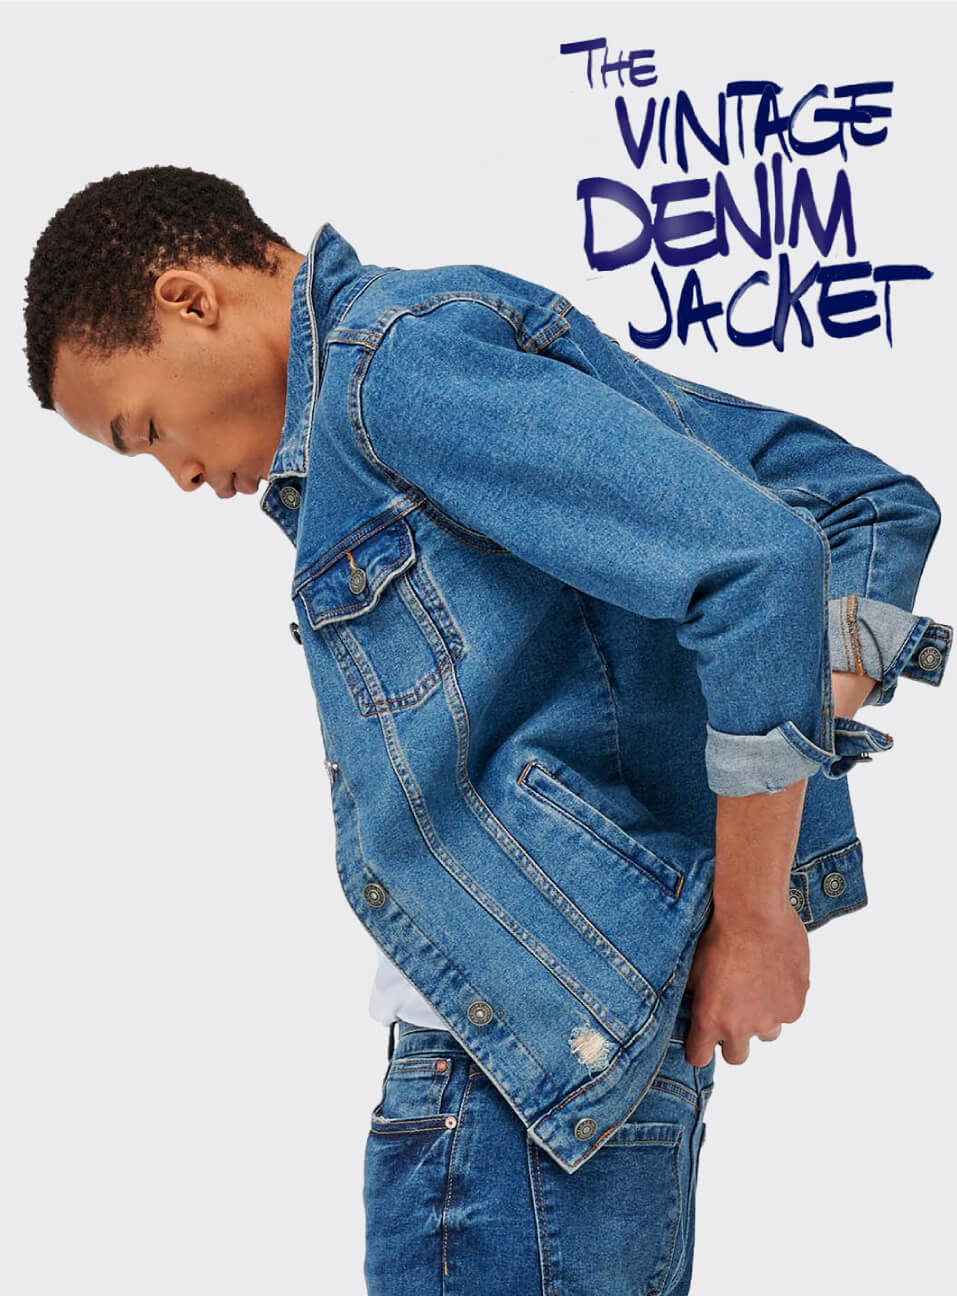 Denim jacket jeans